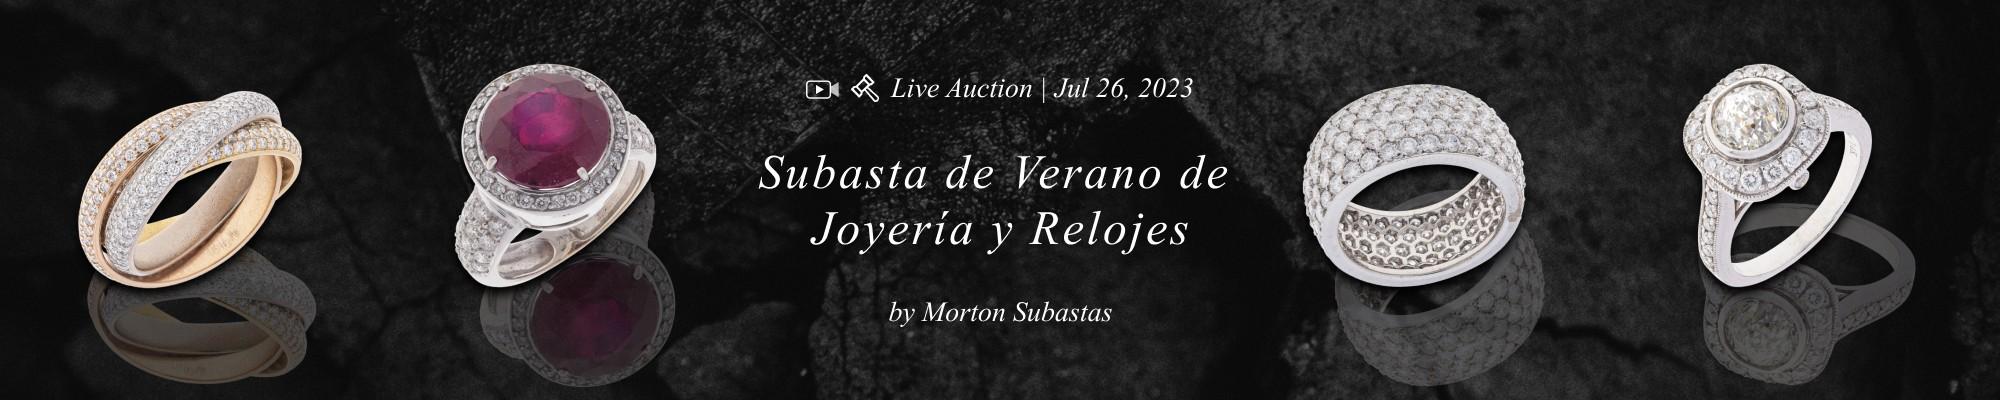 books-and-documents-auction-morton-subastas